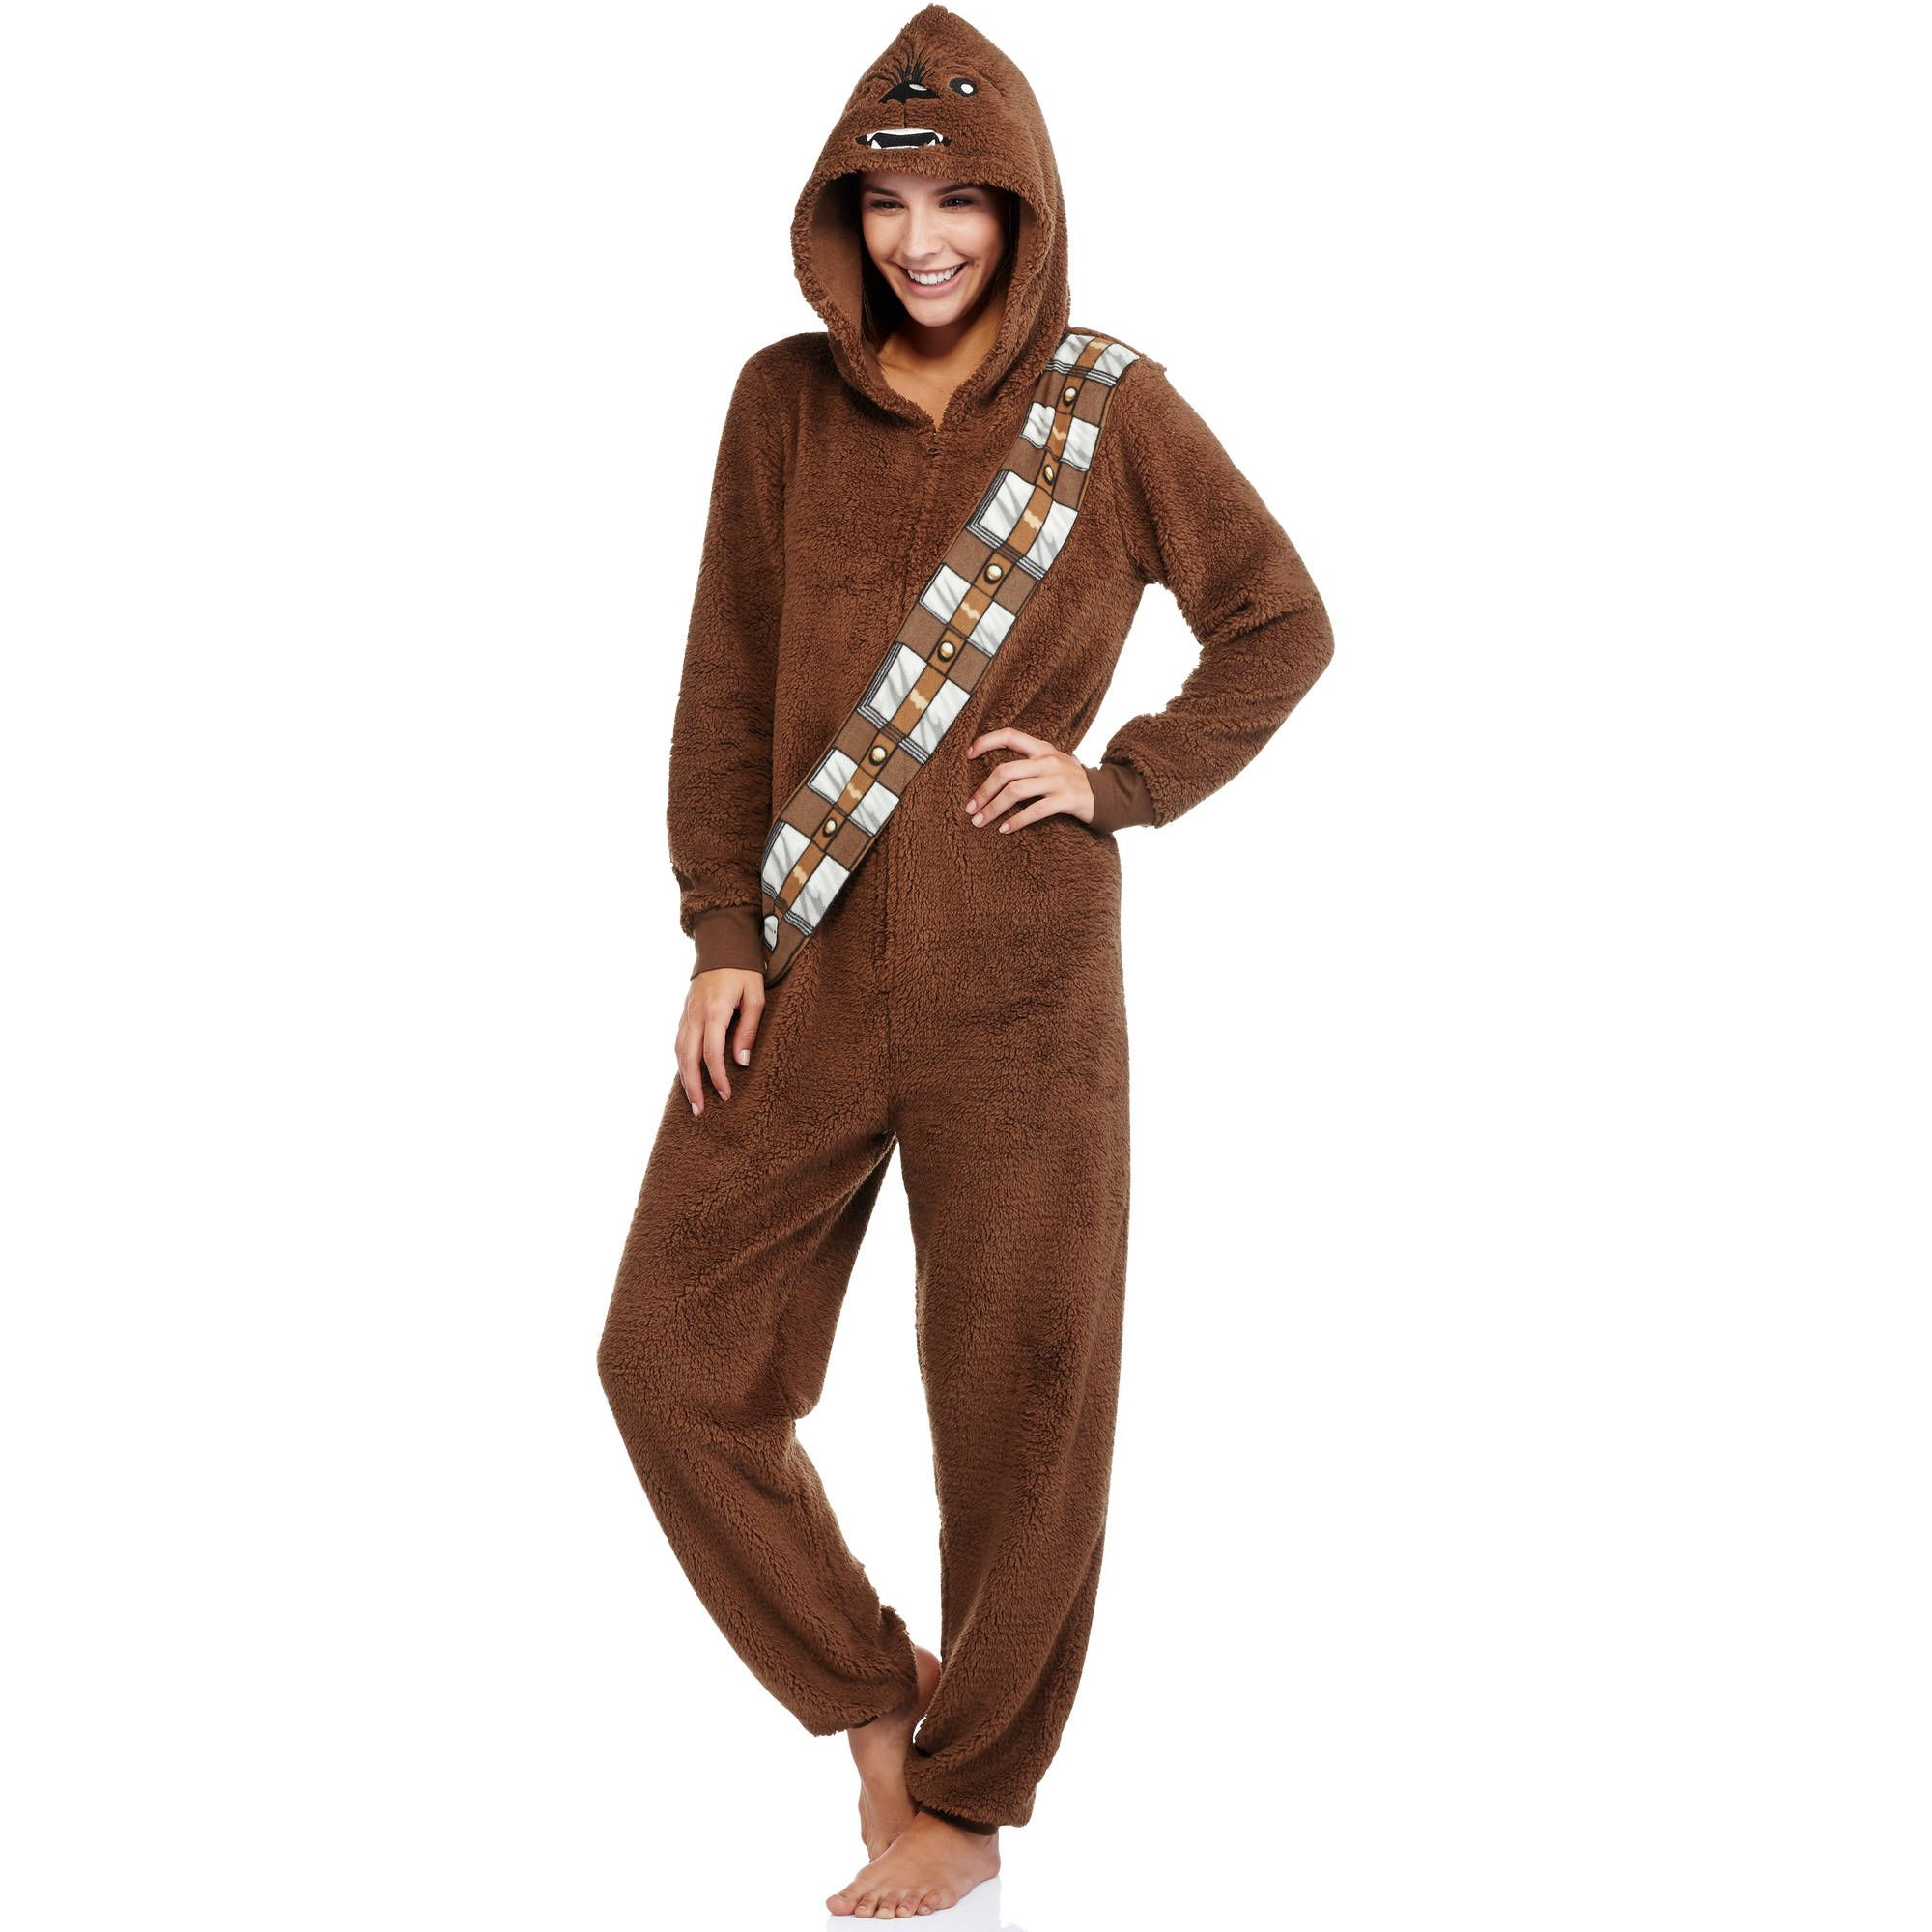 3789f13863bb Star Wars Chewbacca Women s Licensed Pajama Union Suit One Piece ...